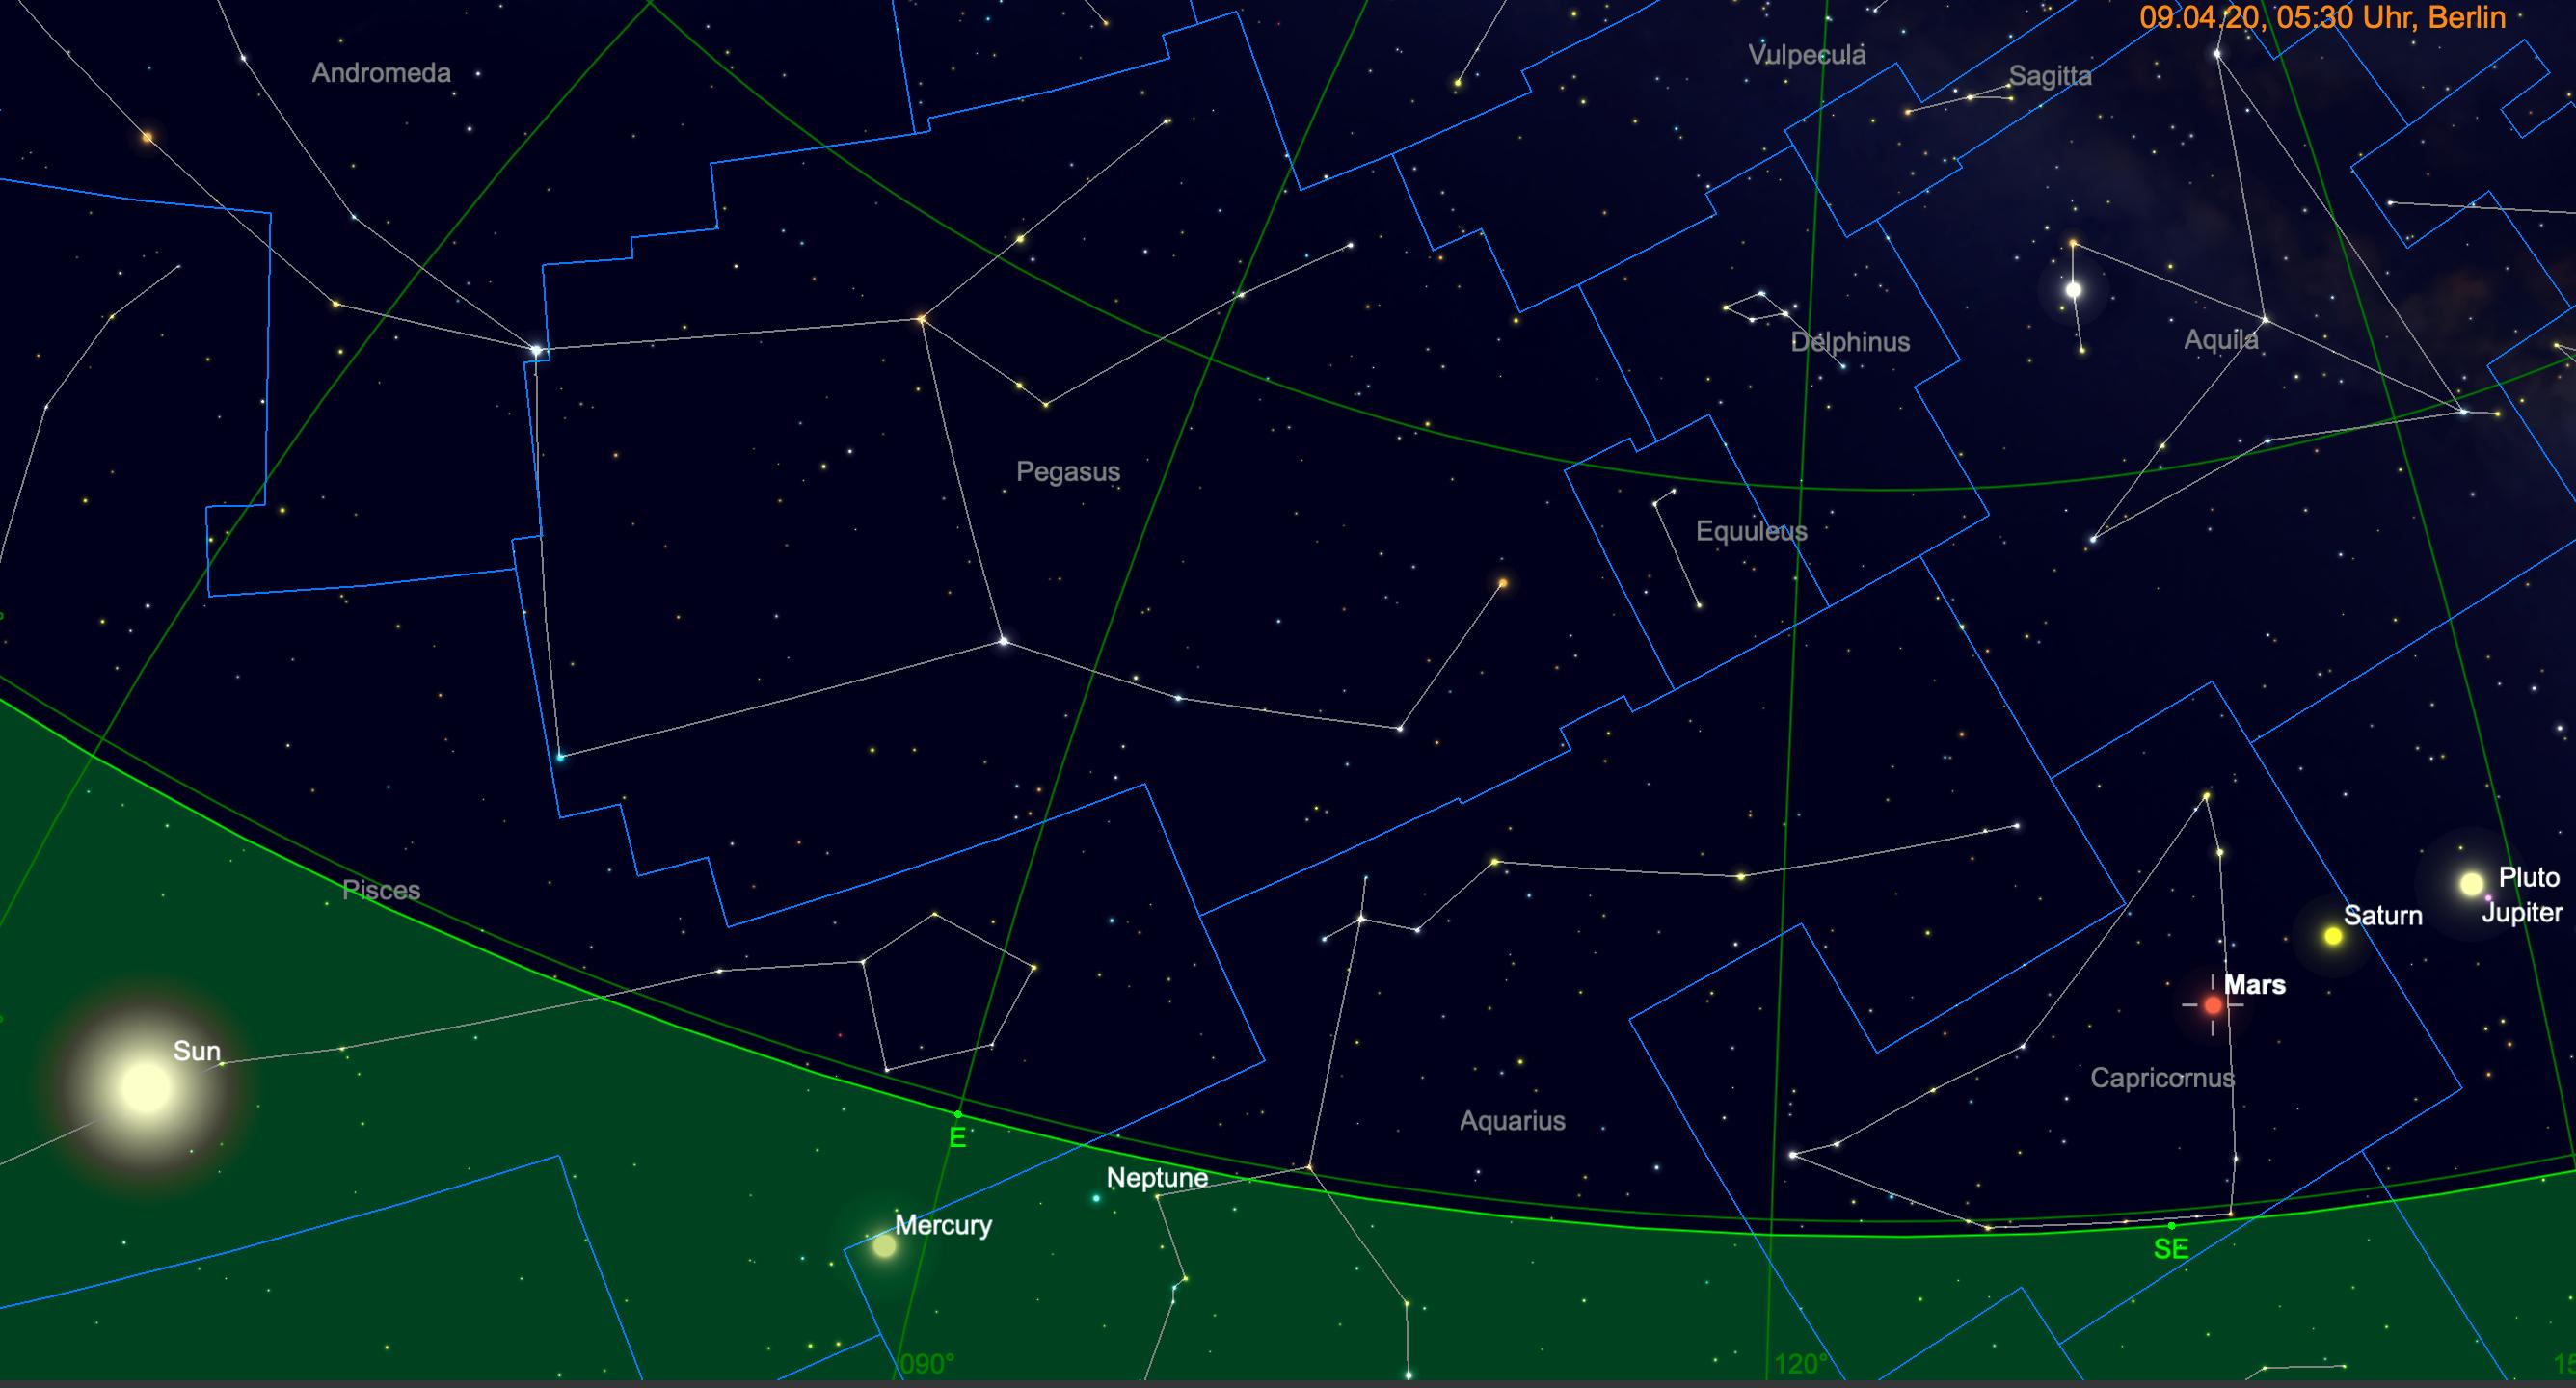 Planetenparade Jupiter, Saturn und Mars